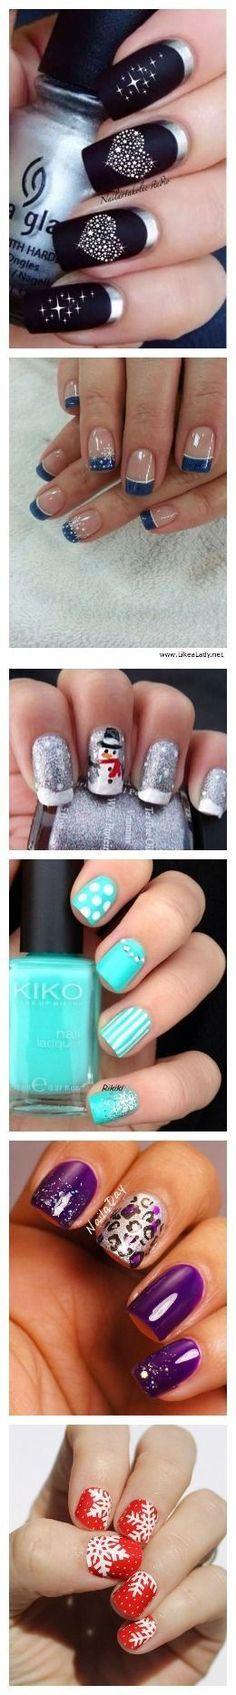 Image via christmas by jauntyjuli #nail #nails #nailart Image via COOL CHRISTMAS NAIL ART DESIGNS 2016 Image via Digg Women's Fashion: Nail Polishes of the Year  Ima Read More Source: – lylajimenez Related